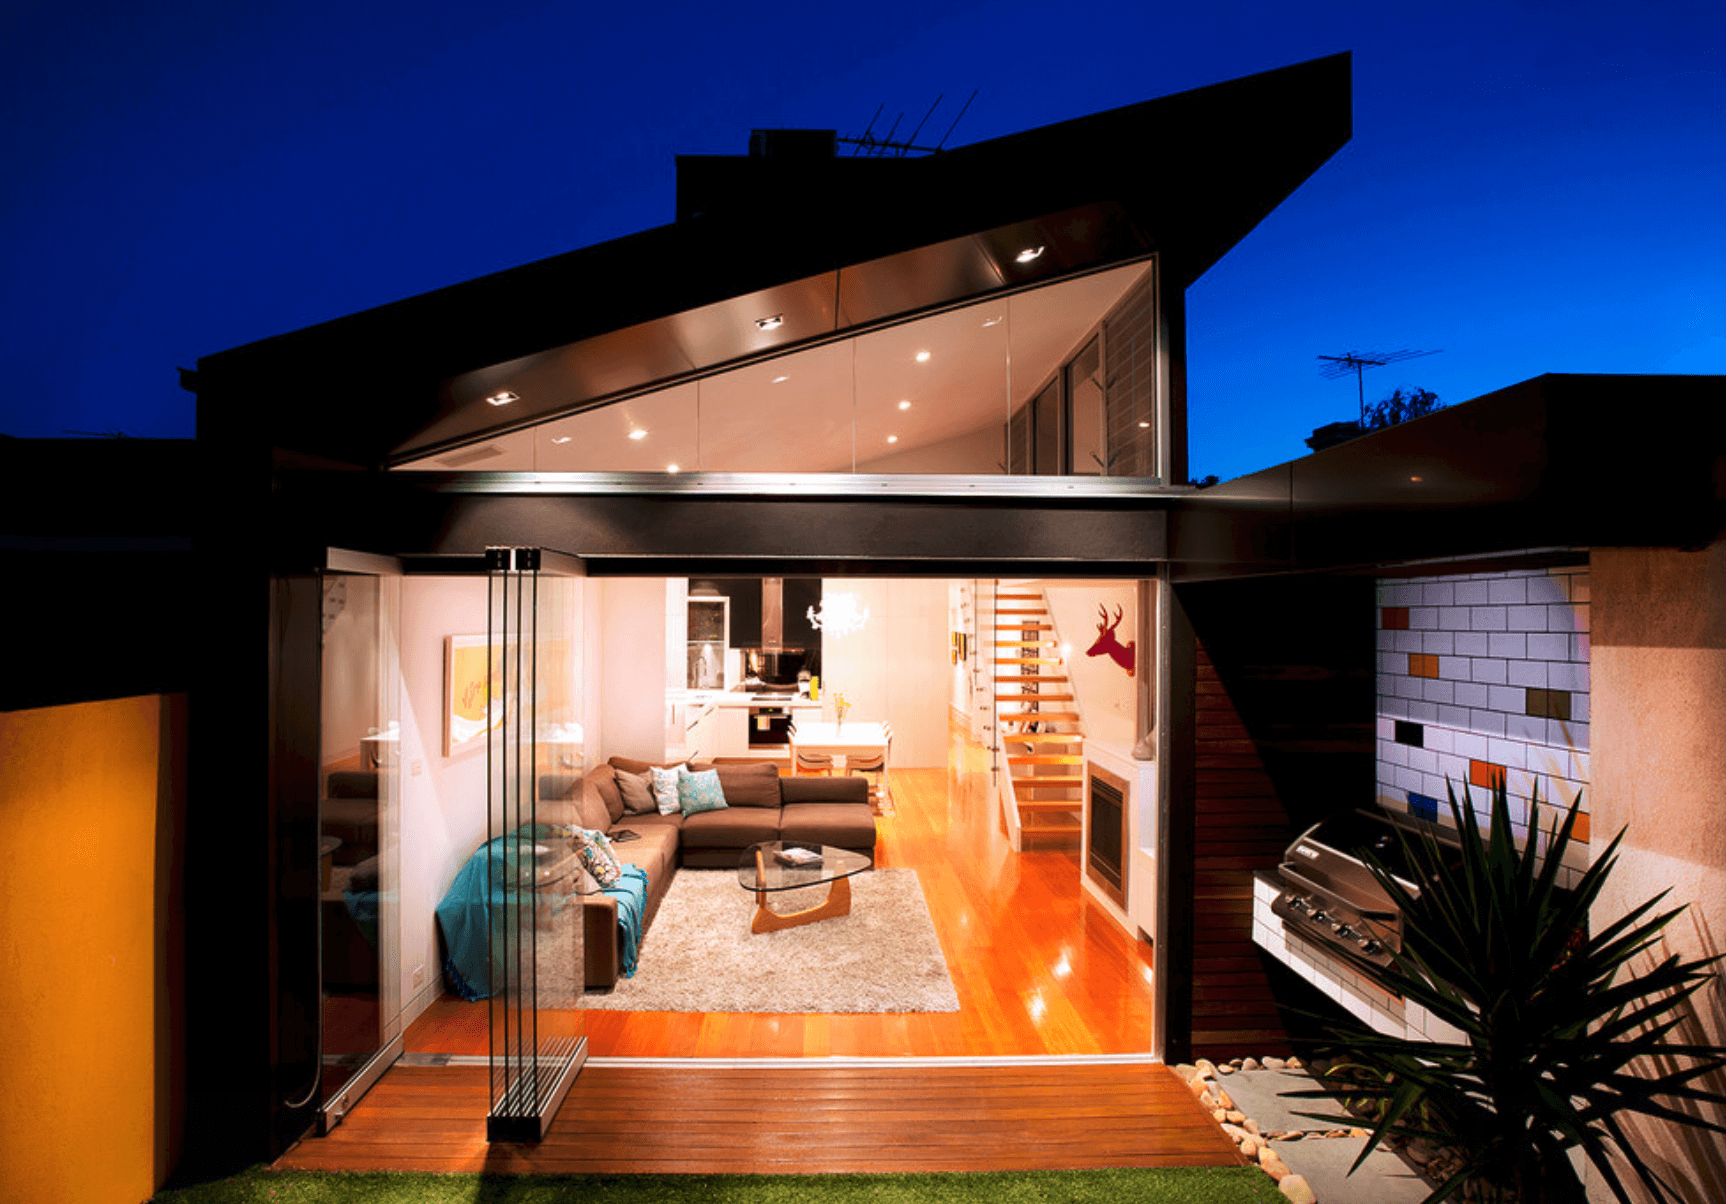 Casas bonitas modernas e simples arquidicas for Casas modernas con puertas antiguas